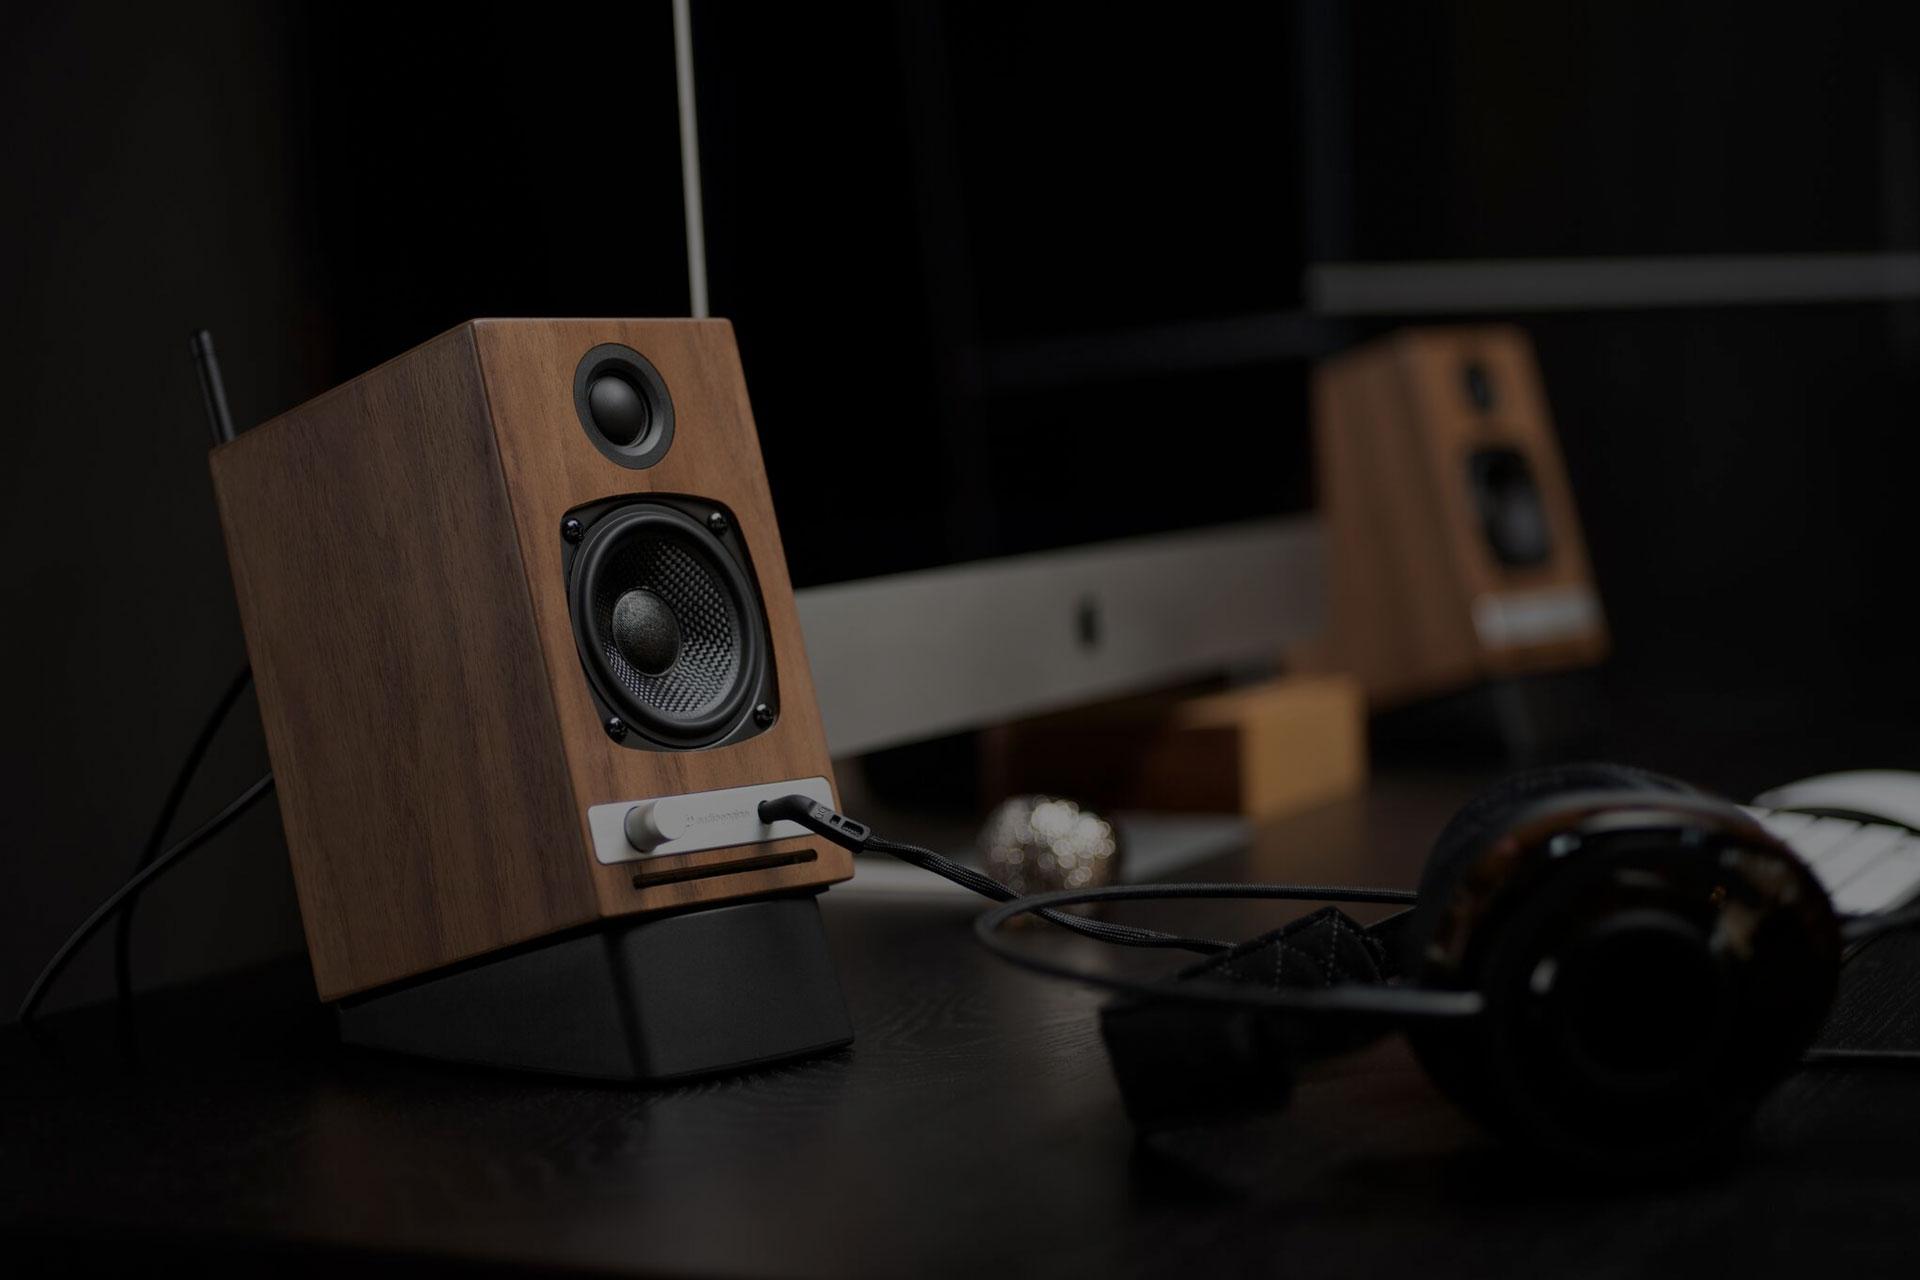 Audioengine Hd3 Wireless Speakers Headphone Reviews And Discussion Hd6 Cherry Website Hero Walnut Desktop Black Overlay 32 Percent